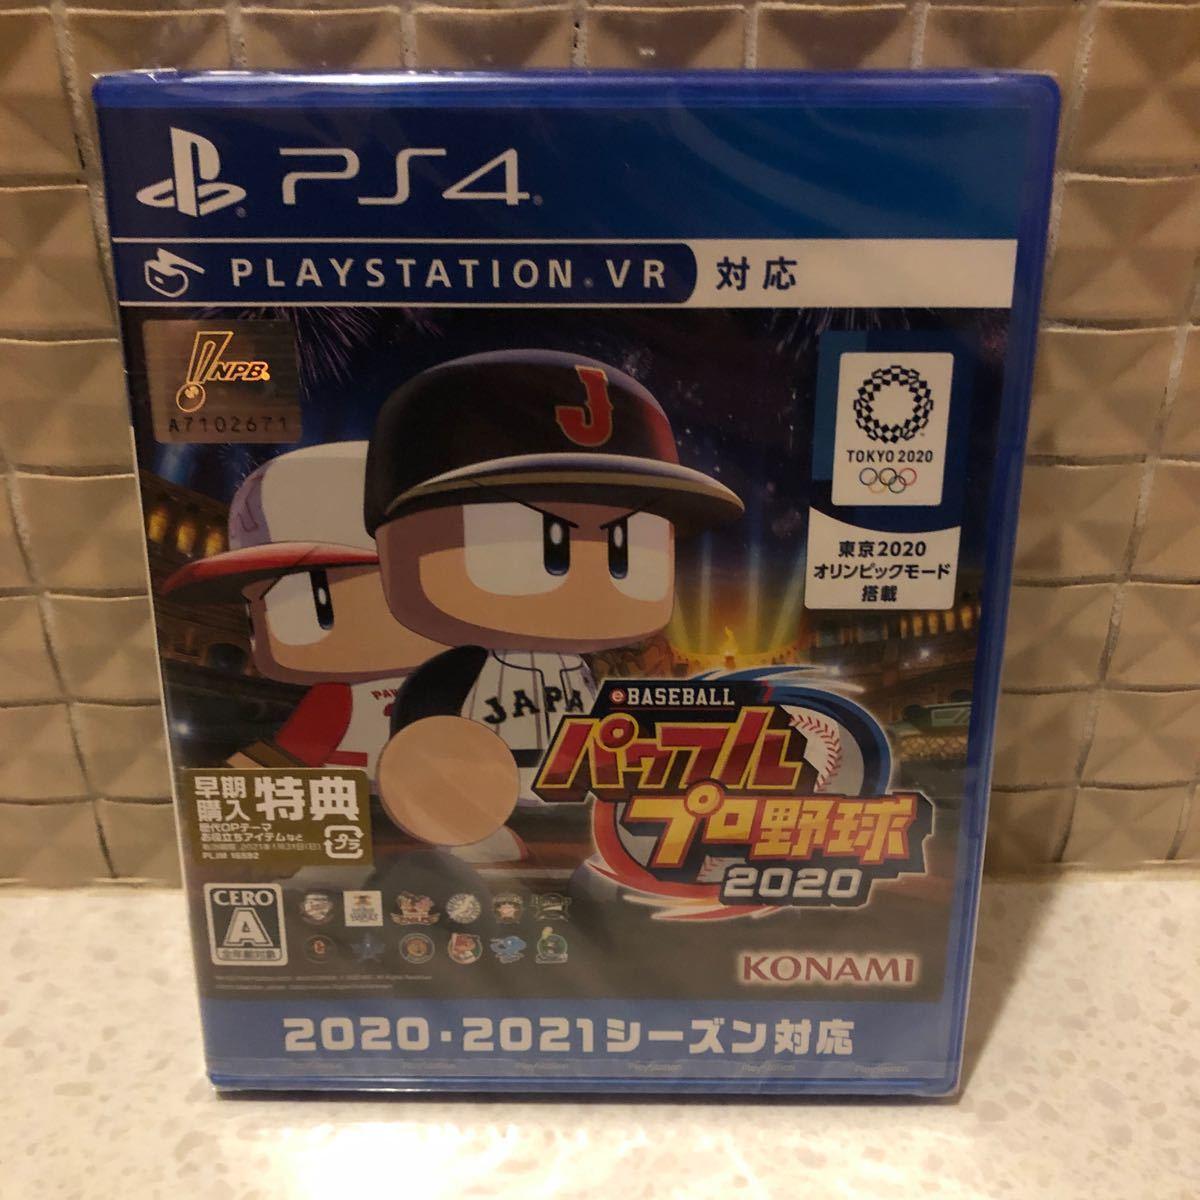 【PS4】 新品未開封 eBASEBALLパワフルプロ野球2020